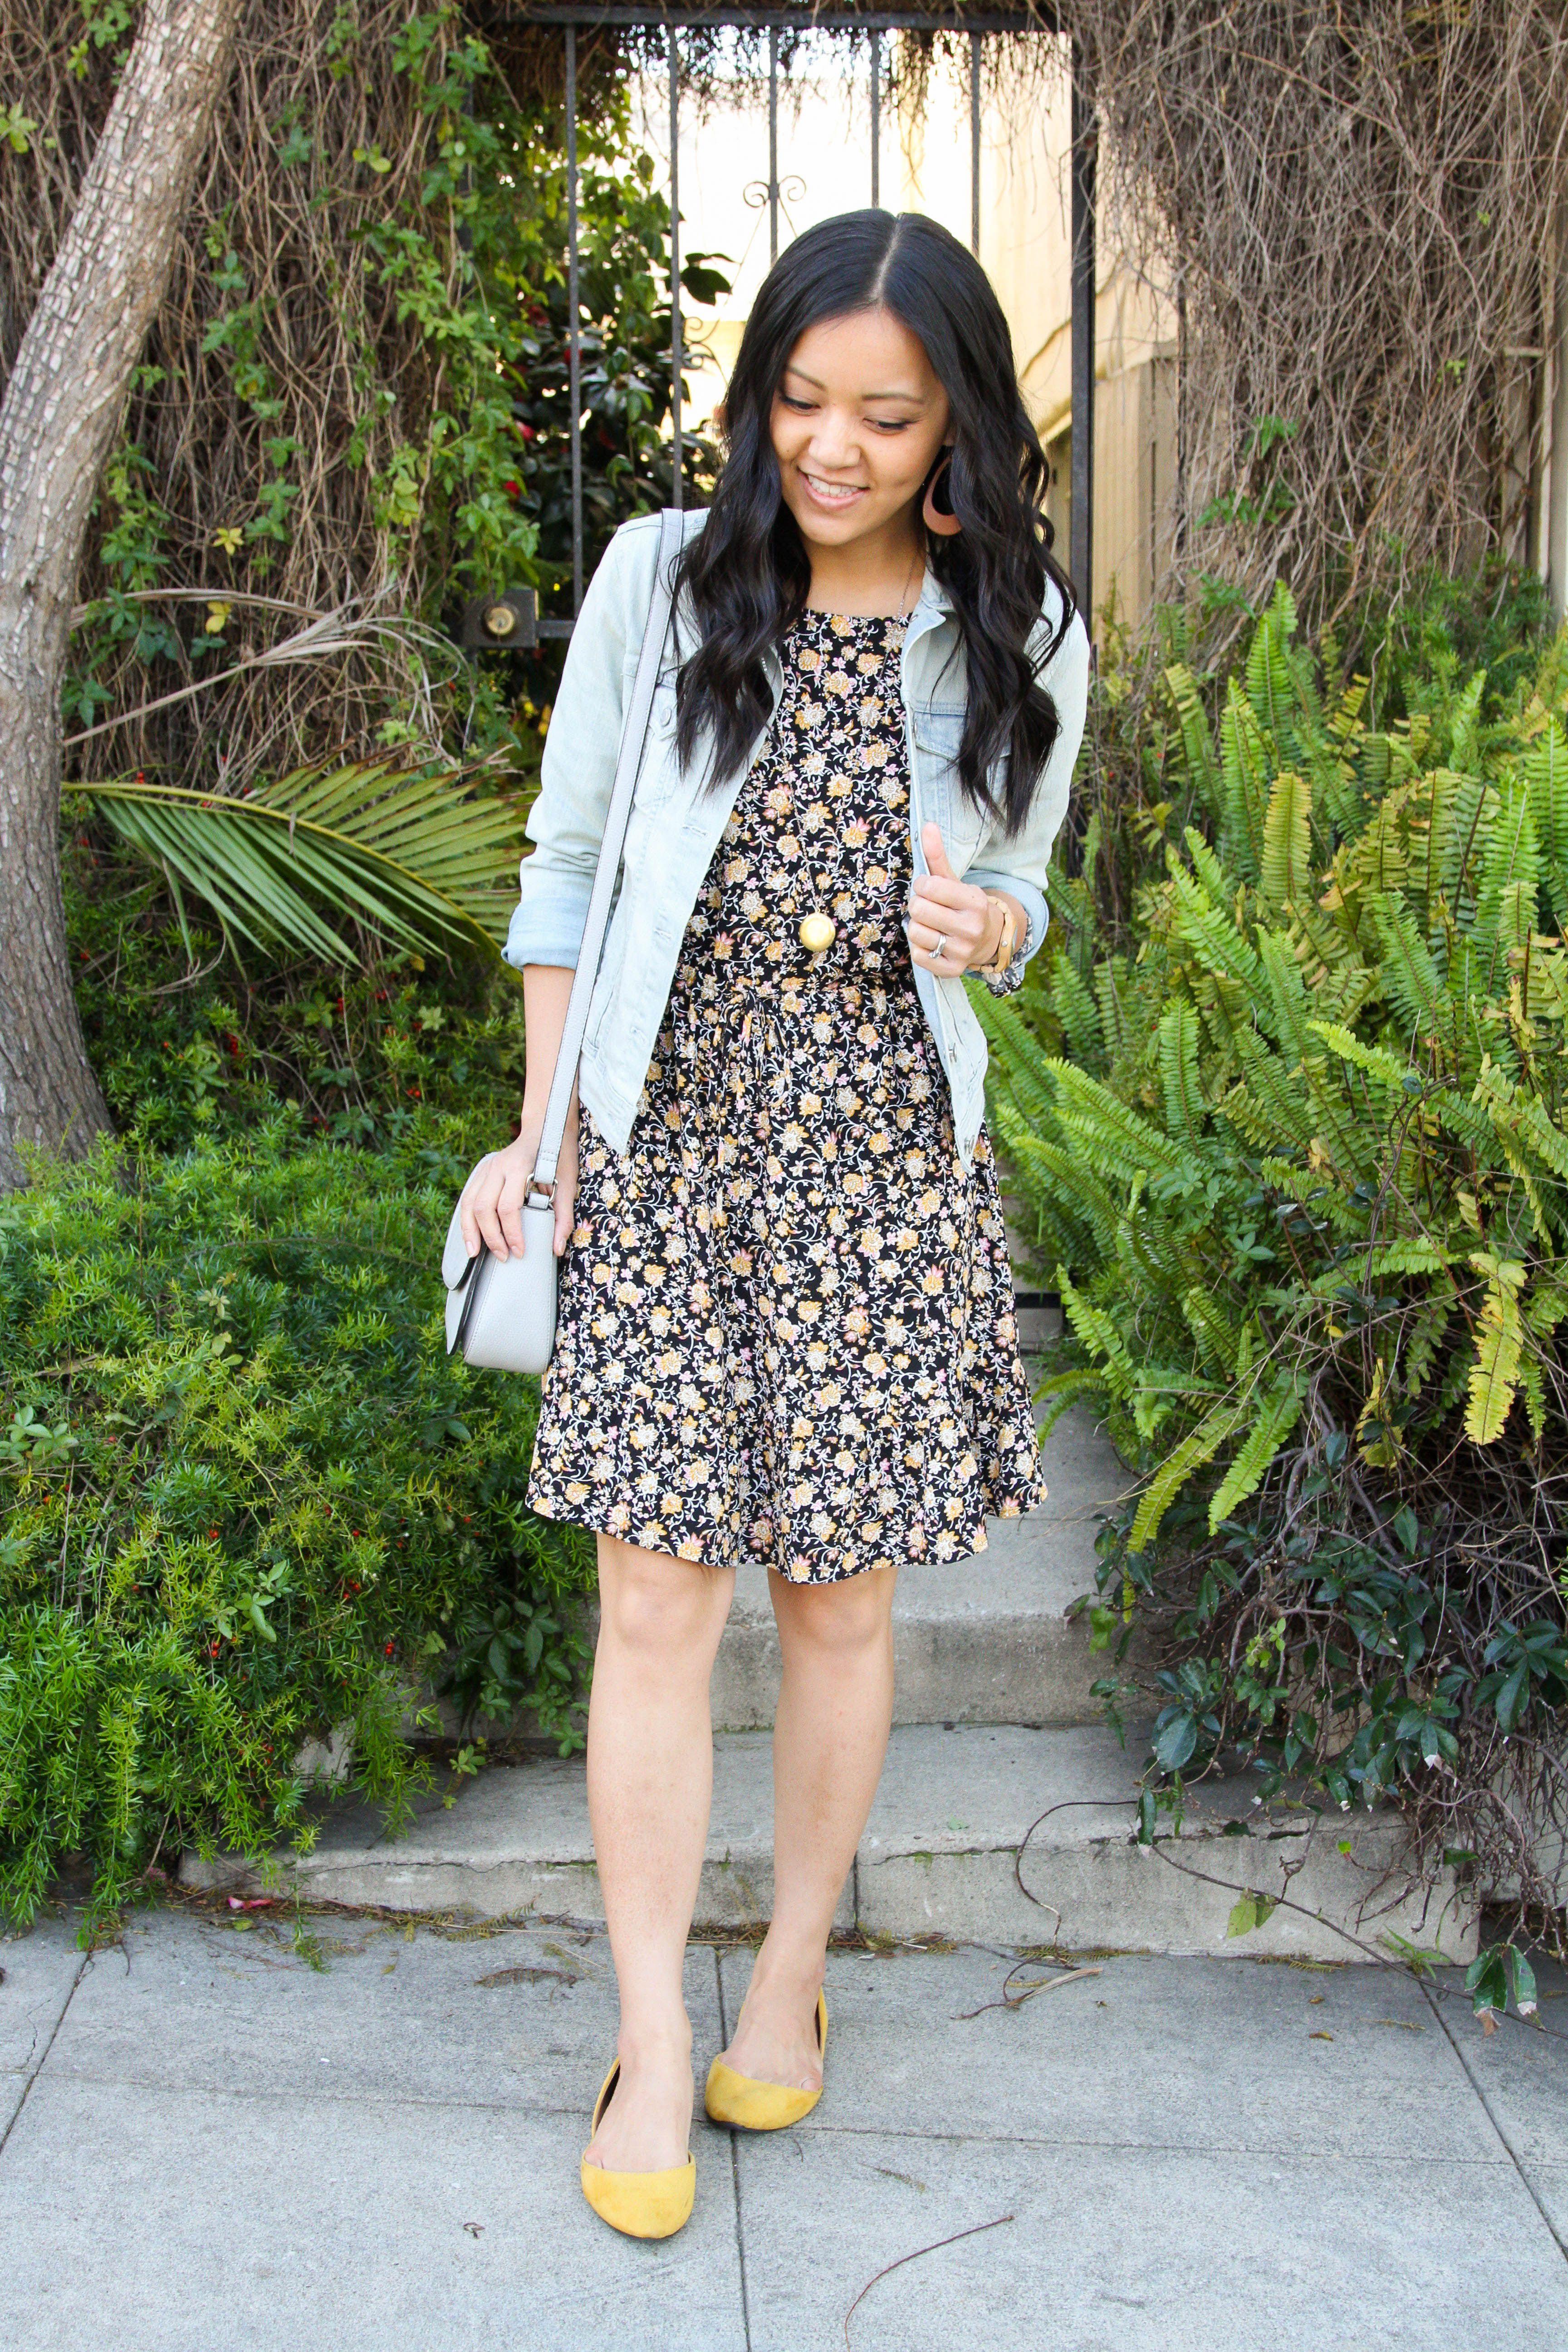 b8c097ec5c24 Black Floral Dress + Denim Jacket + Yellow Flats + Grey Crossbody Bag